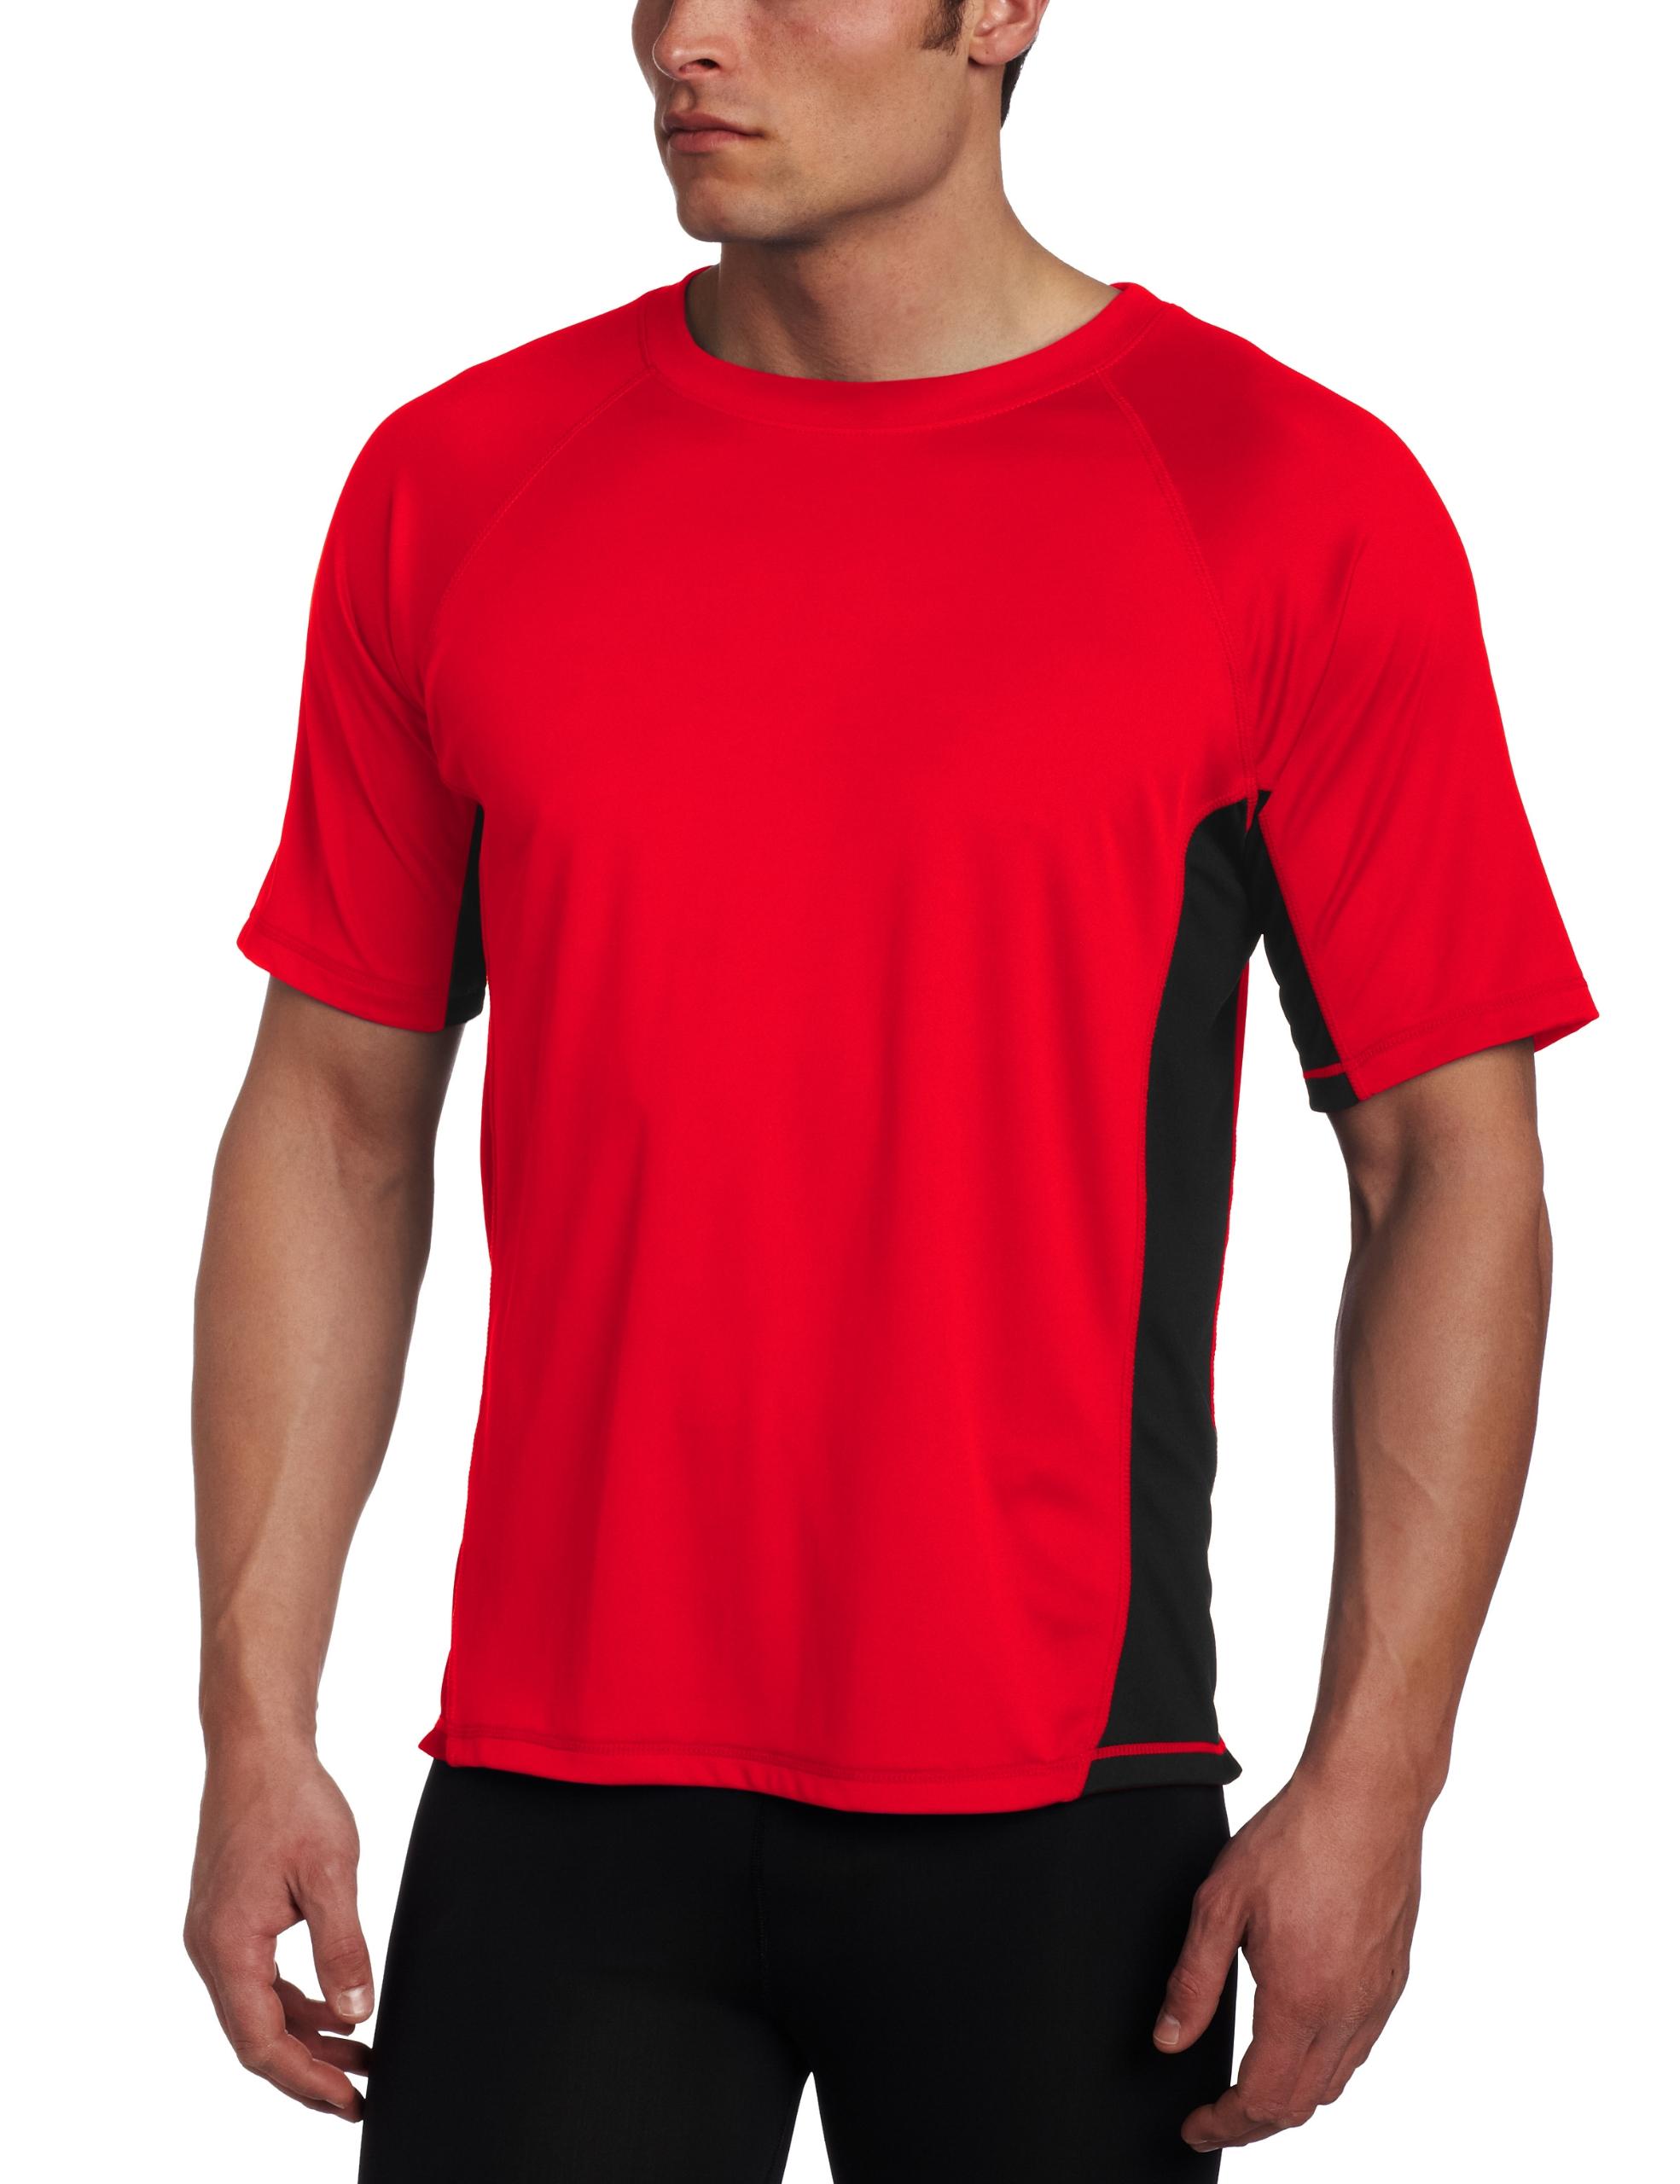 Kanu Surf Men's CB Rashguard UPF 50+ Swim Shirt, Red, 2X-Large